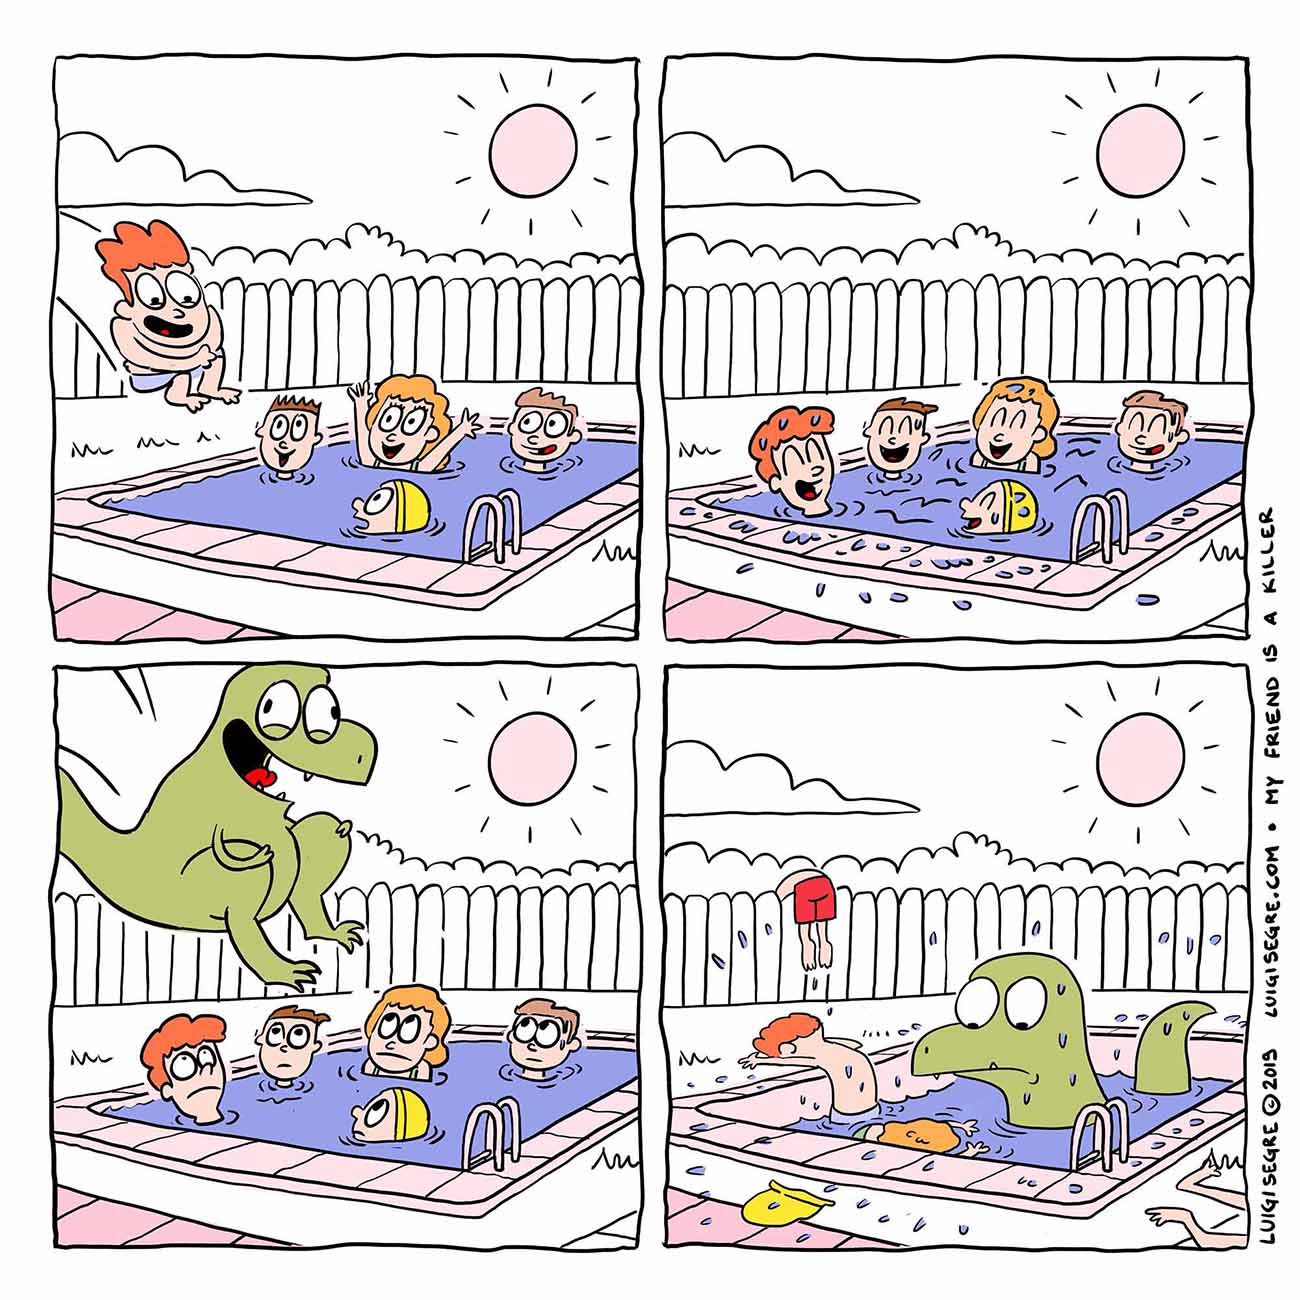 Contenuti_Low_Res_Luigi_Segre_Cartoons_2019_my_friend_is_a_killer_05.jpg